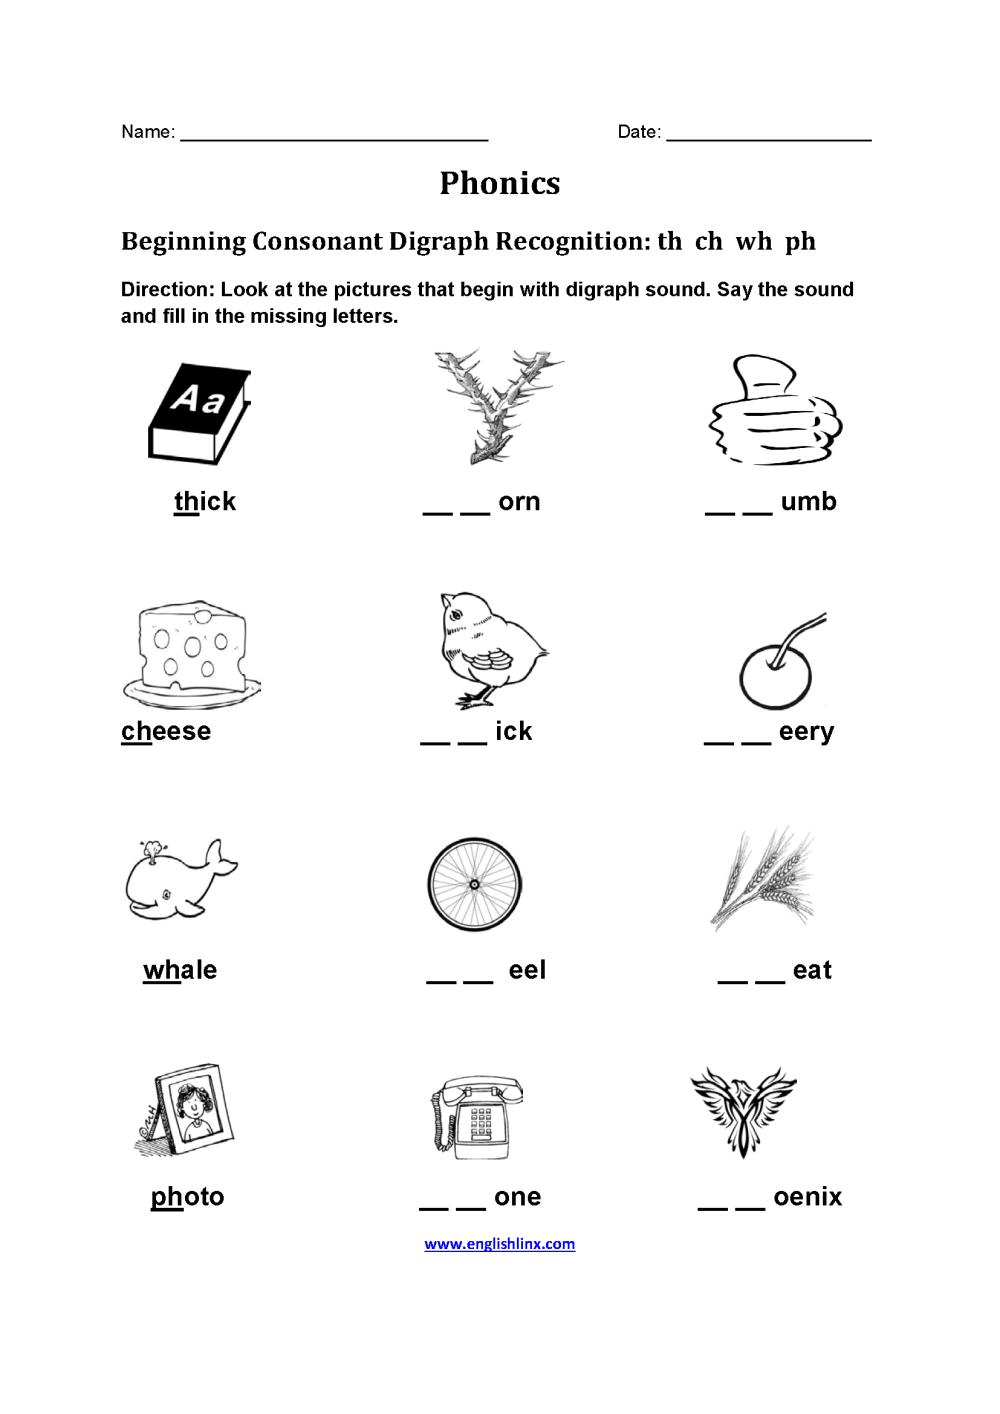 medium resolution of Englishlinx.com   Phonics Worksheets